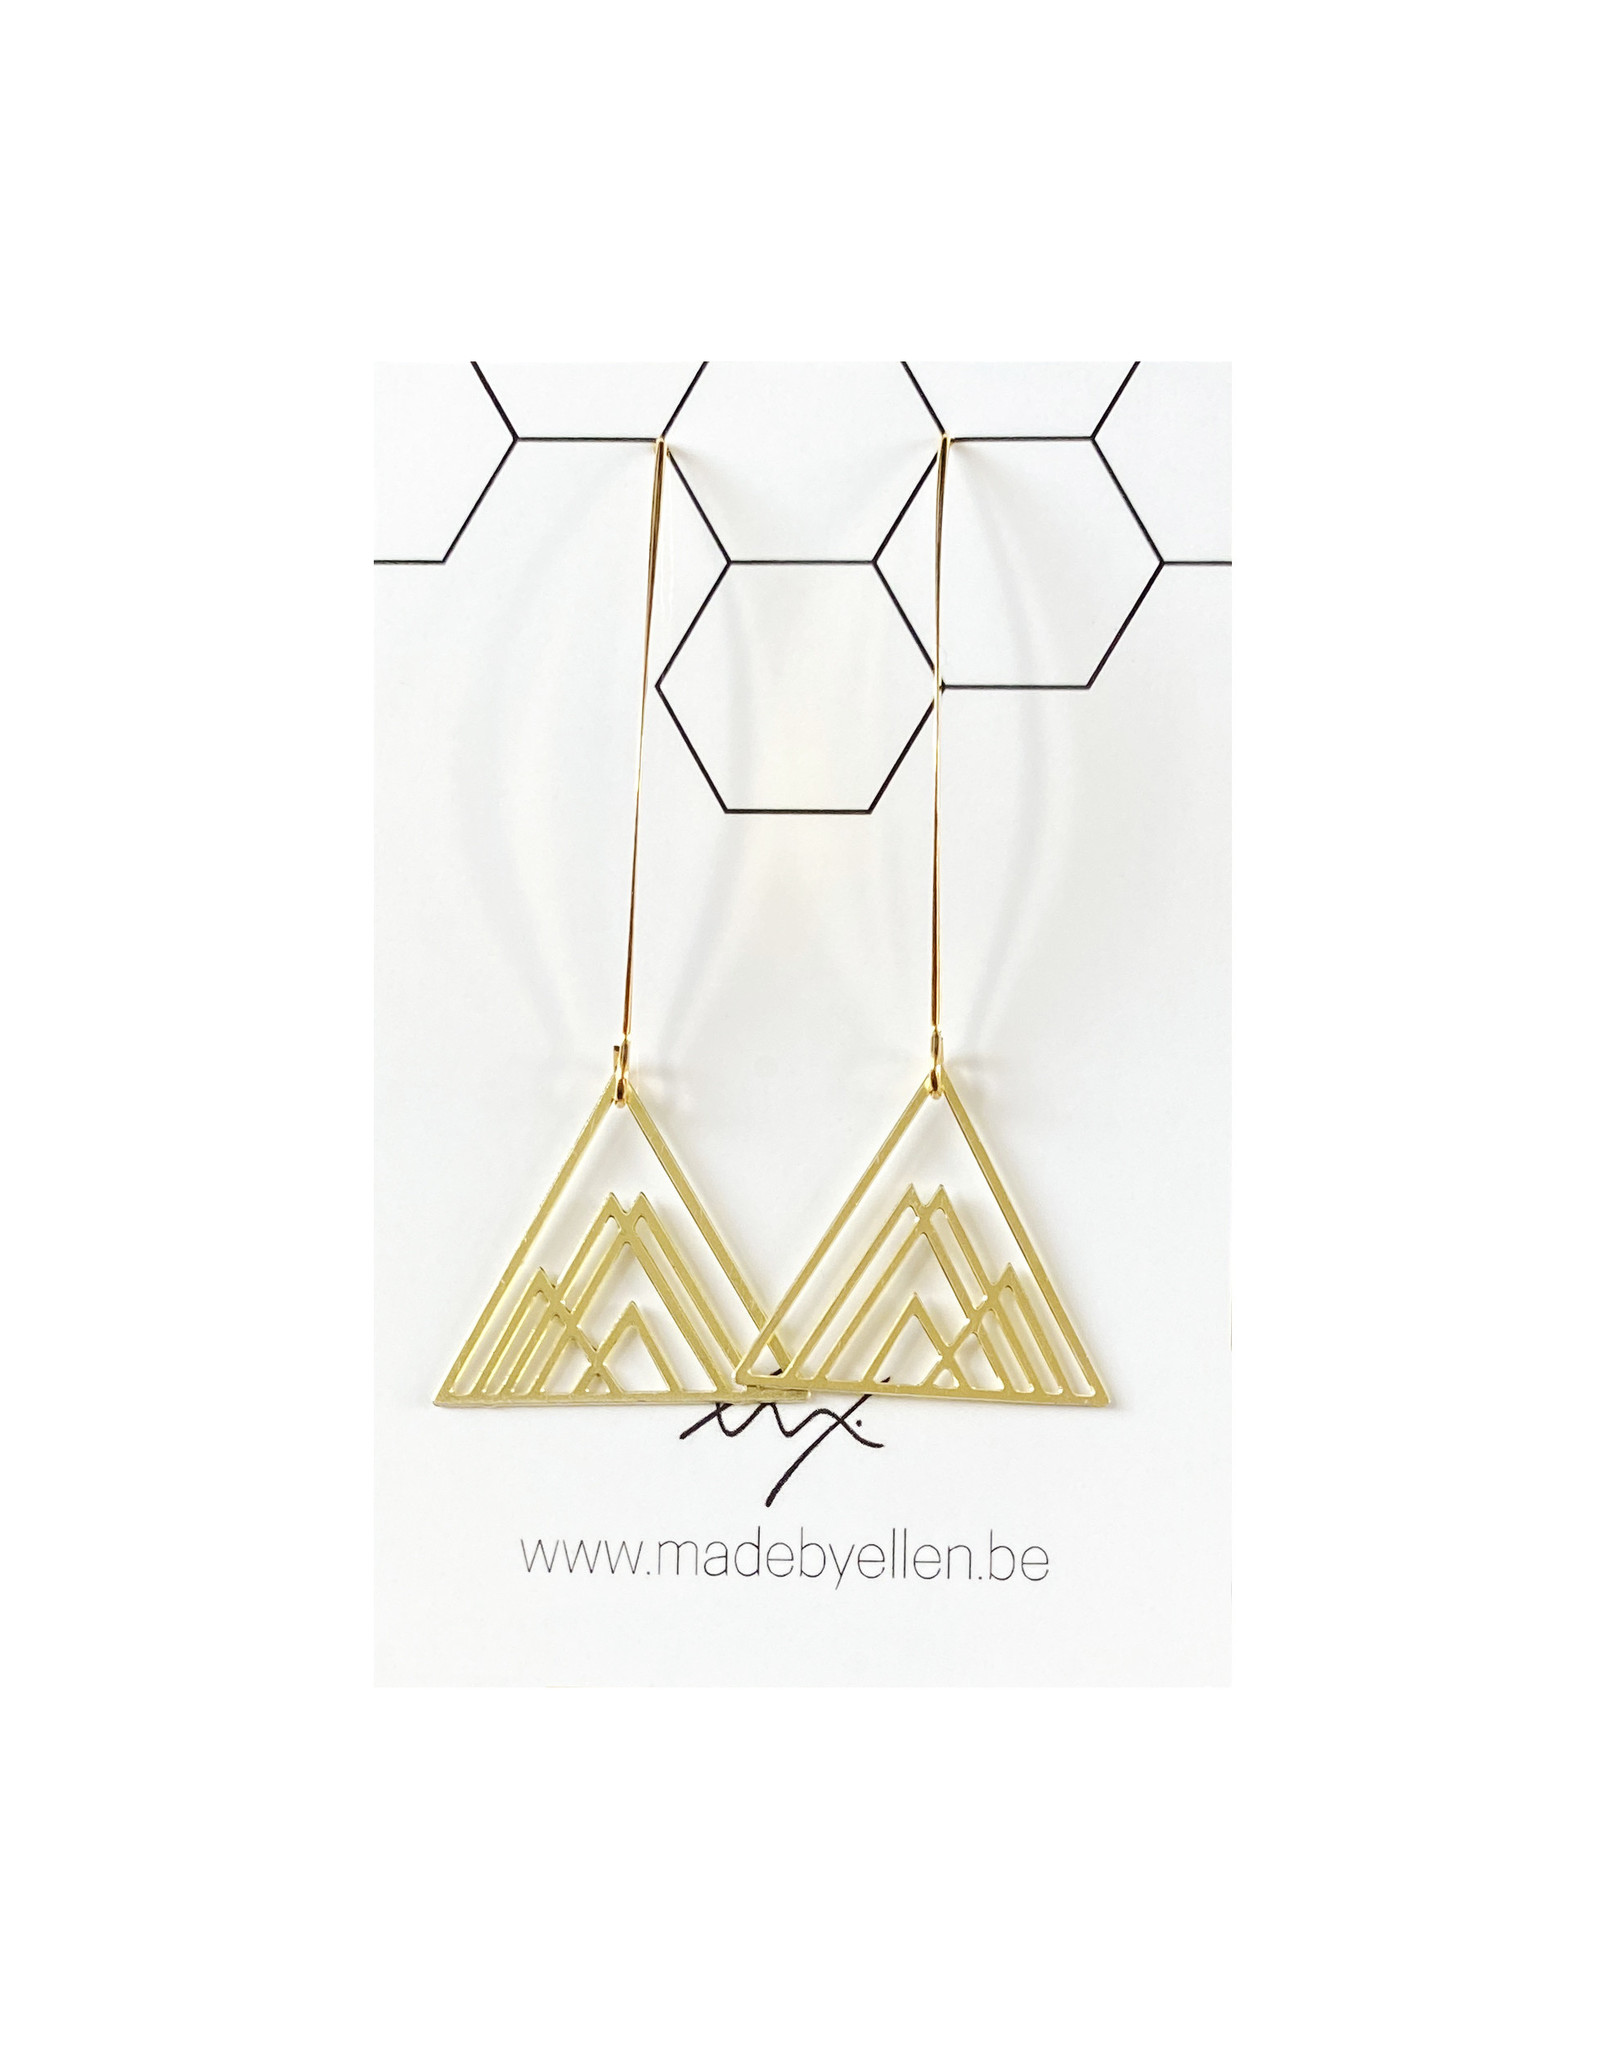 Hangers goudkleurig driehoeken klein